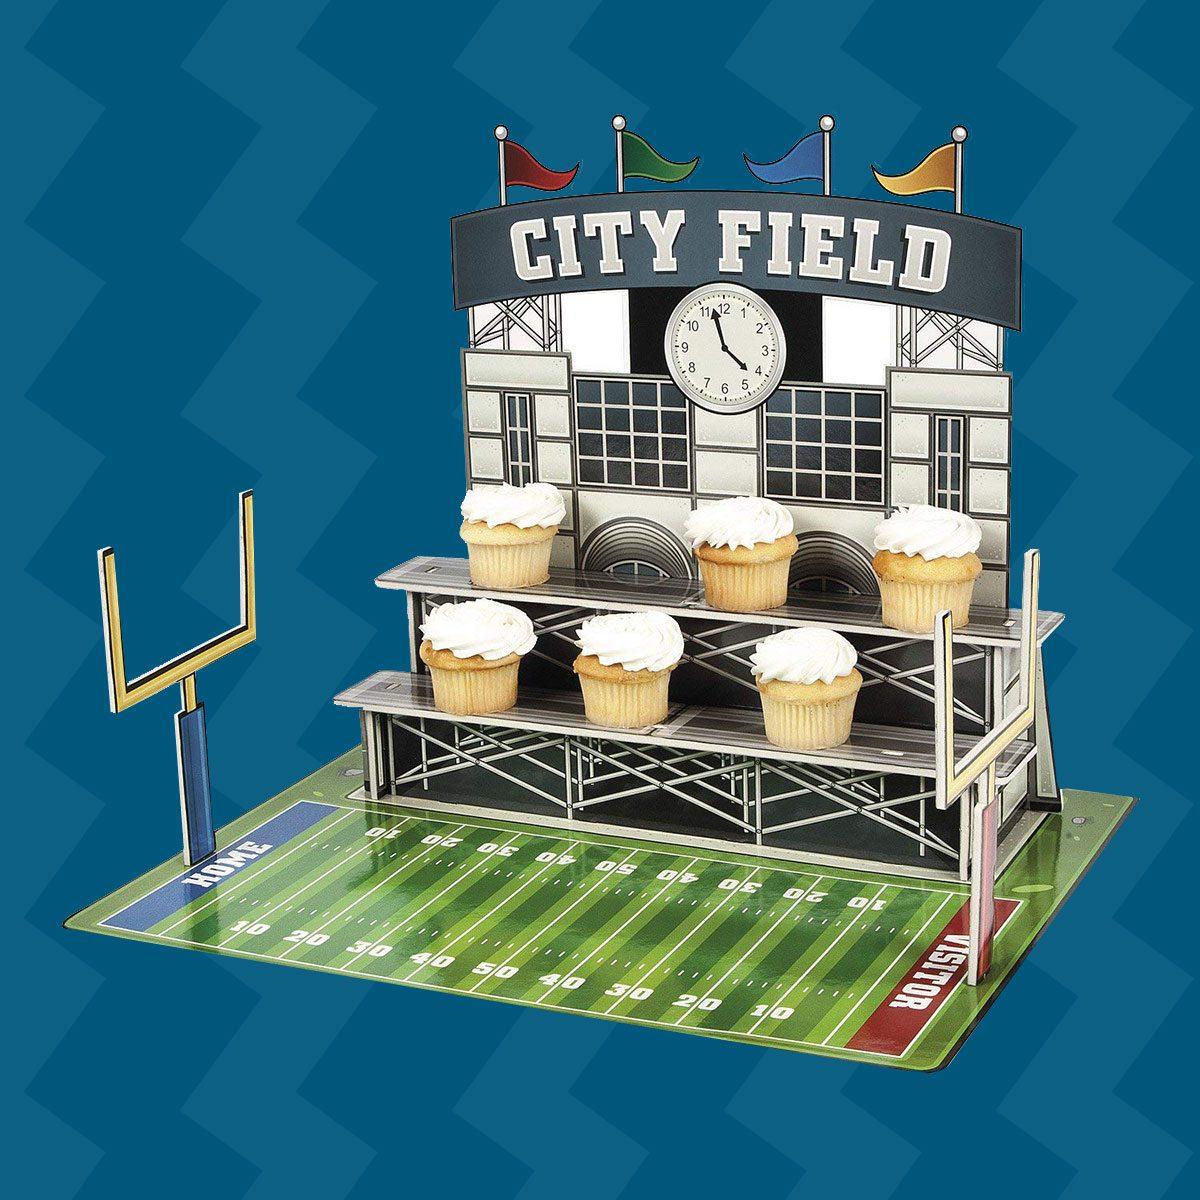 Cupcake stadium